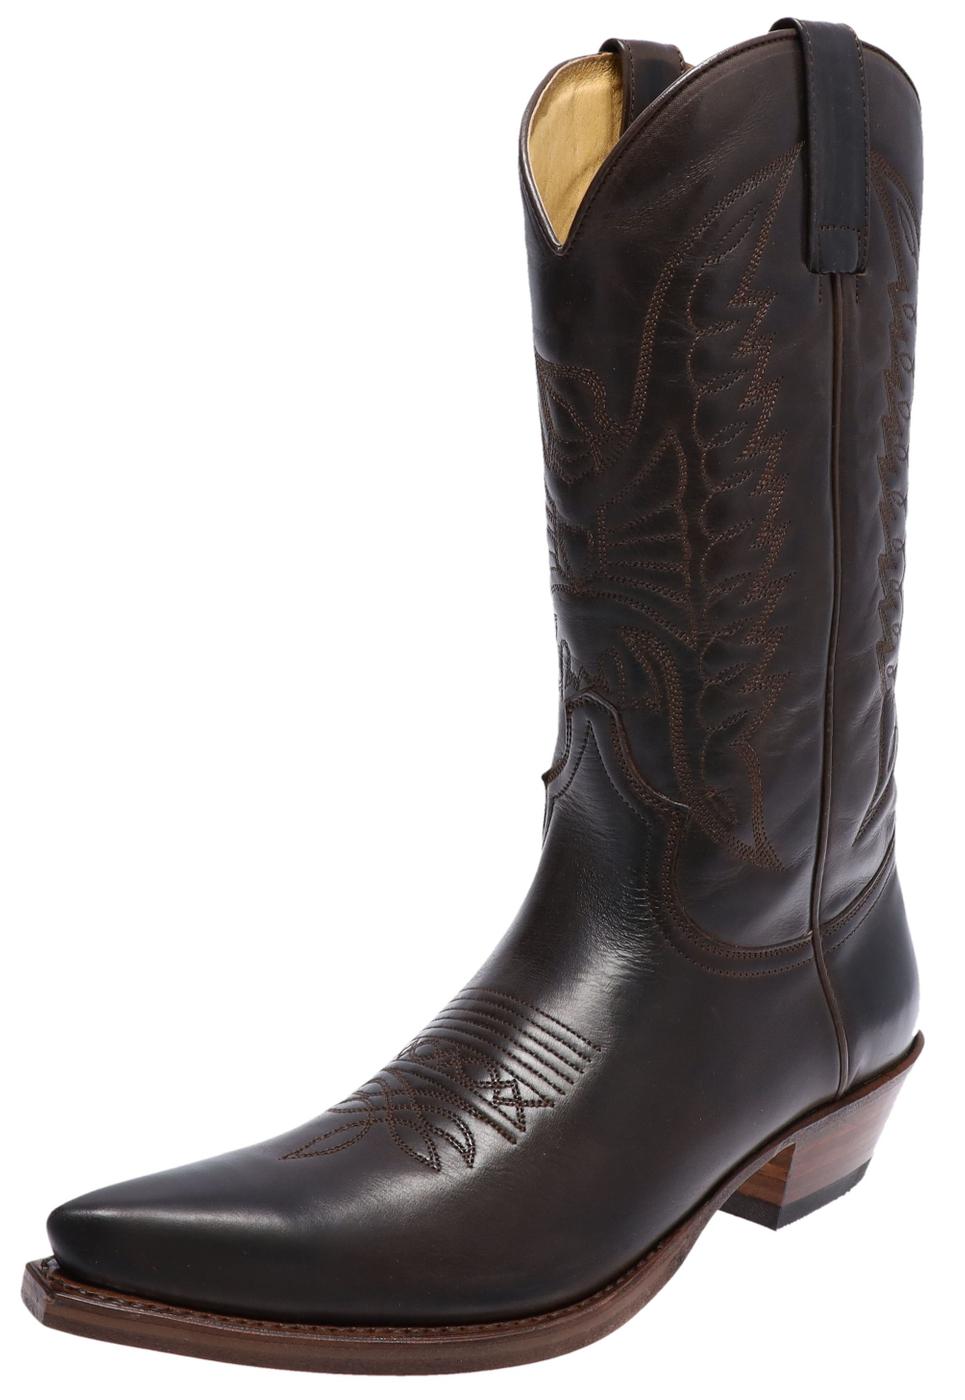 Sendra Boots 2073 Snowbut Marron western laars - Bruin